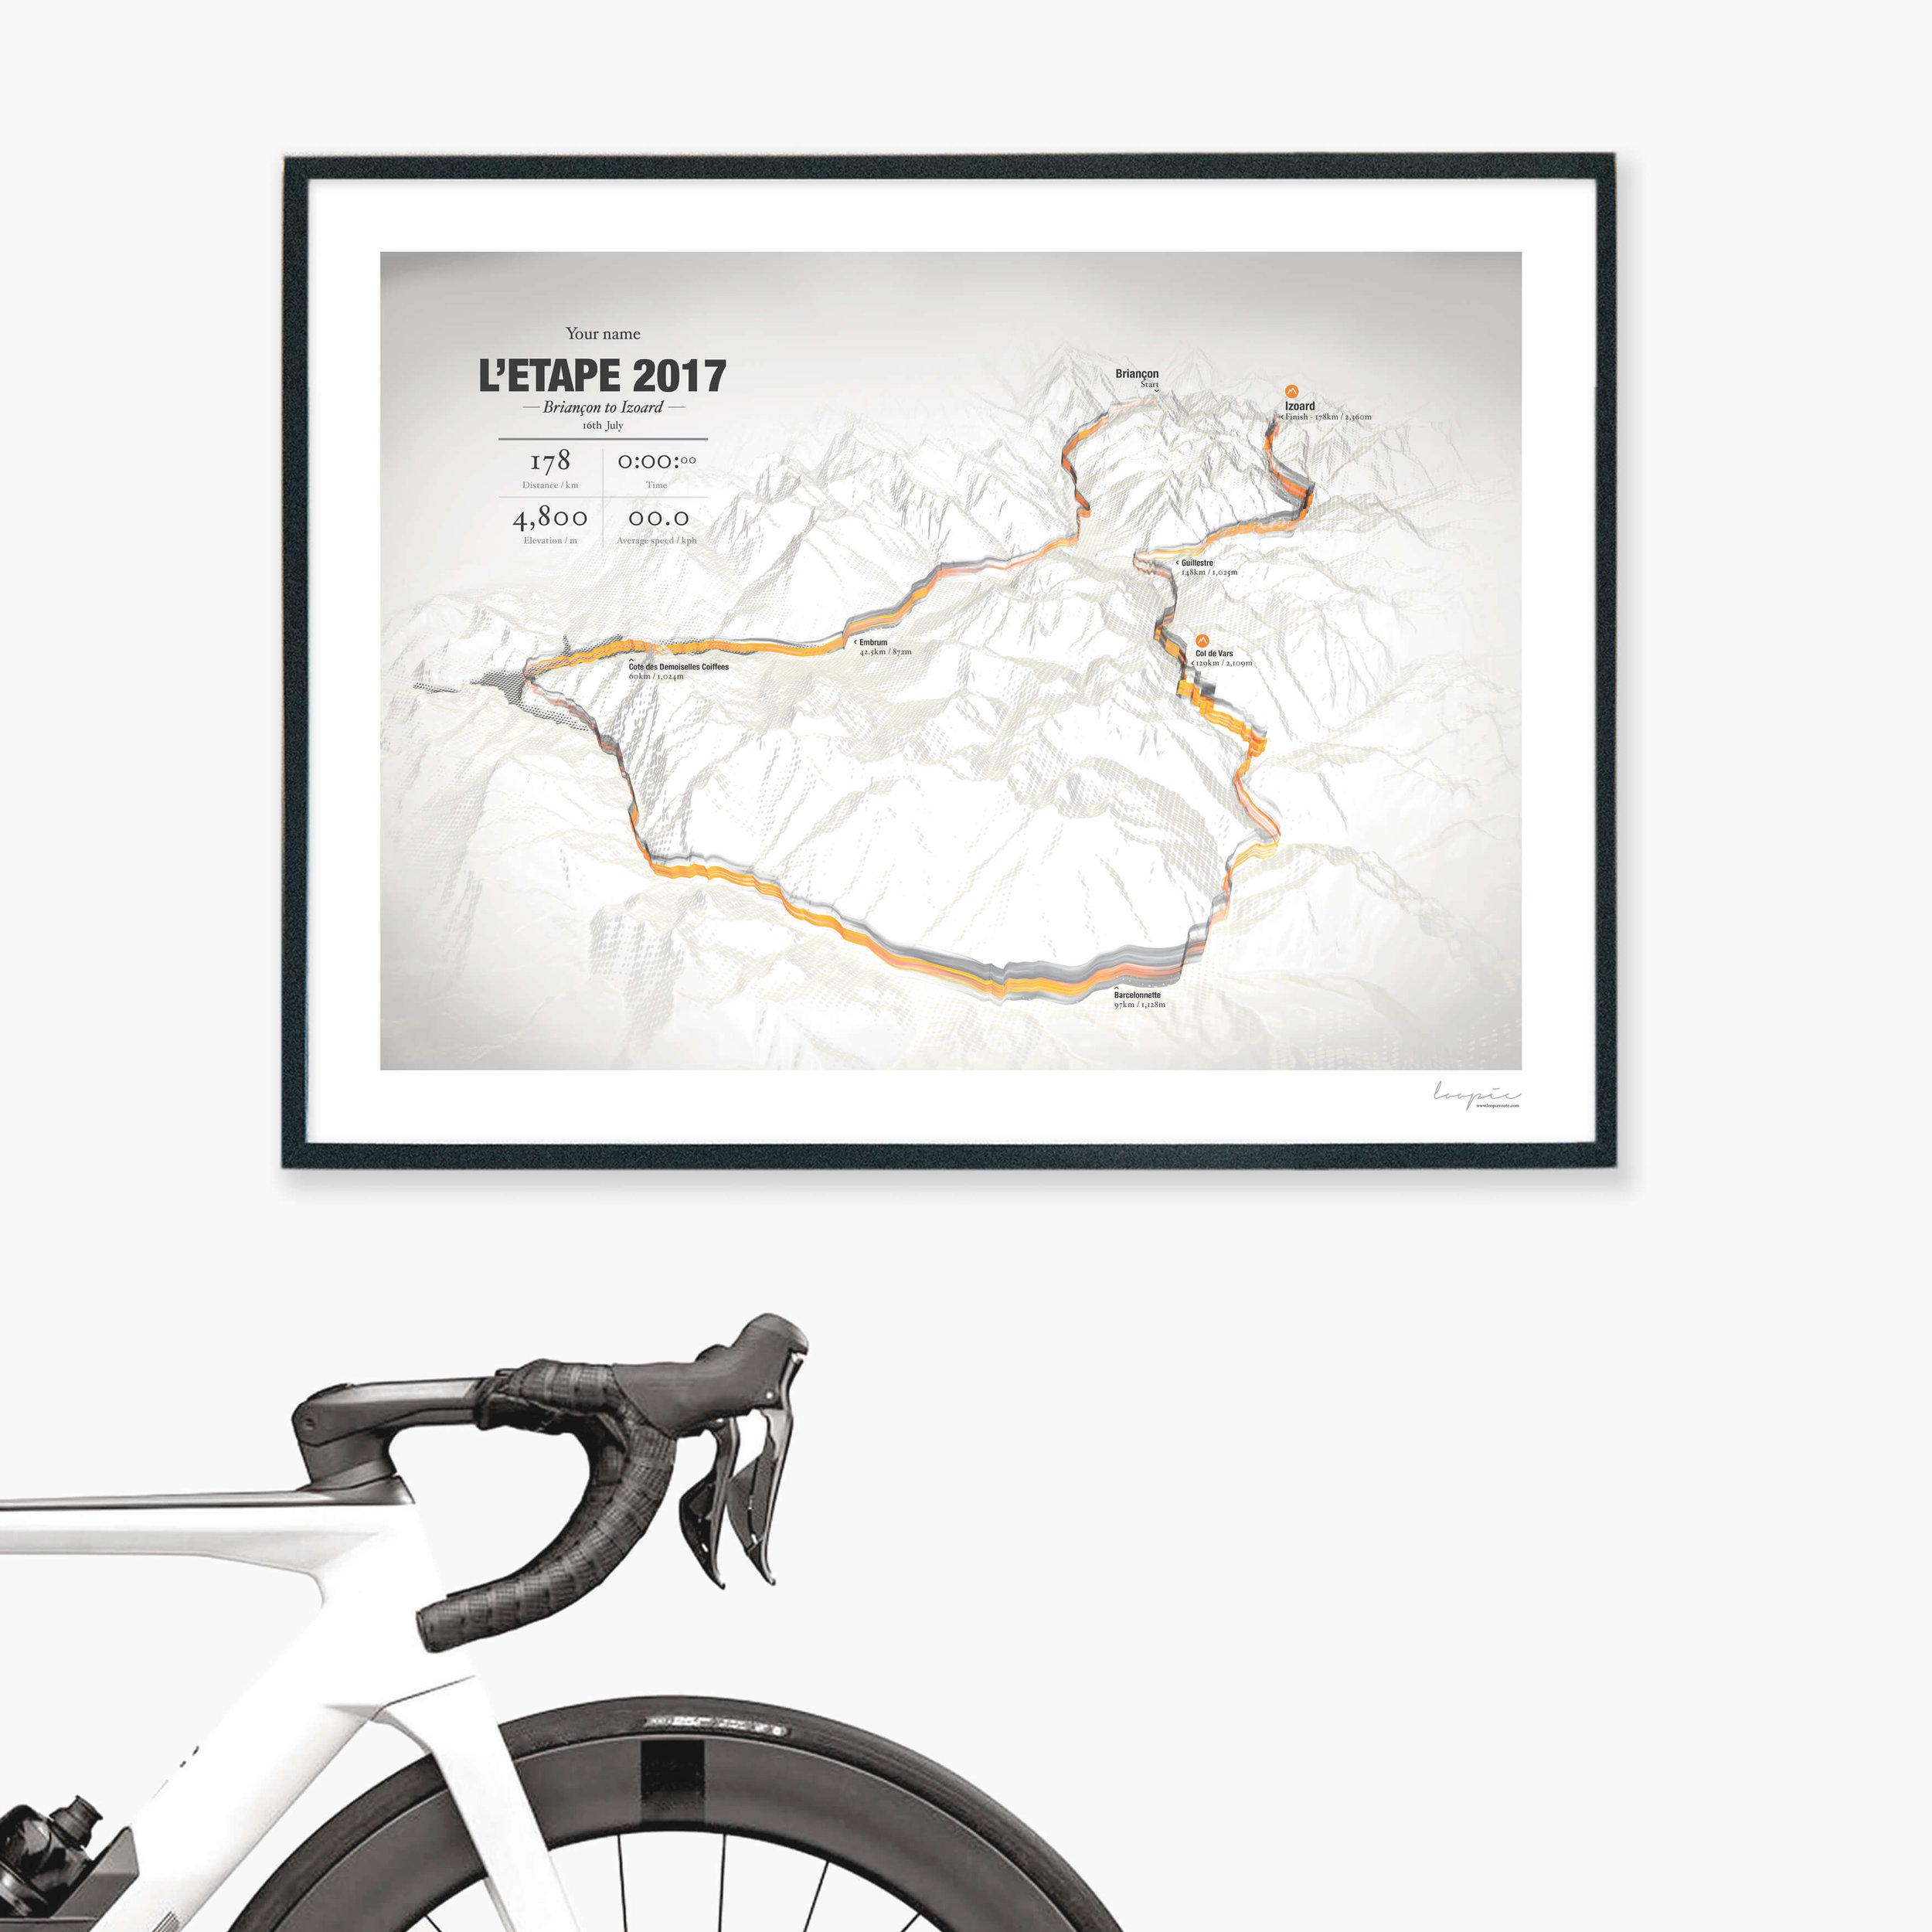 L'Etape2017 - Briançon to Izoard / 178km